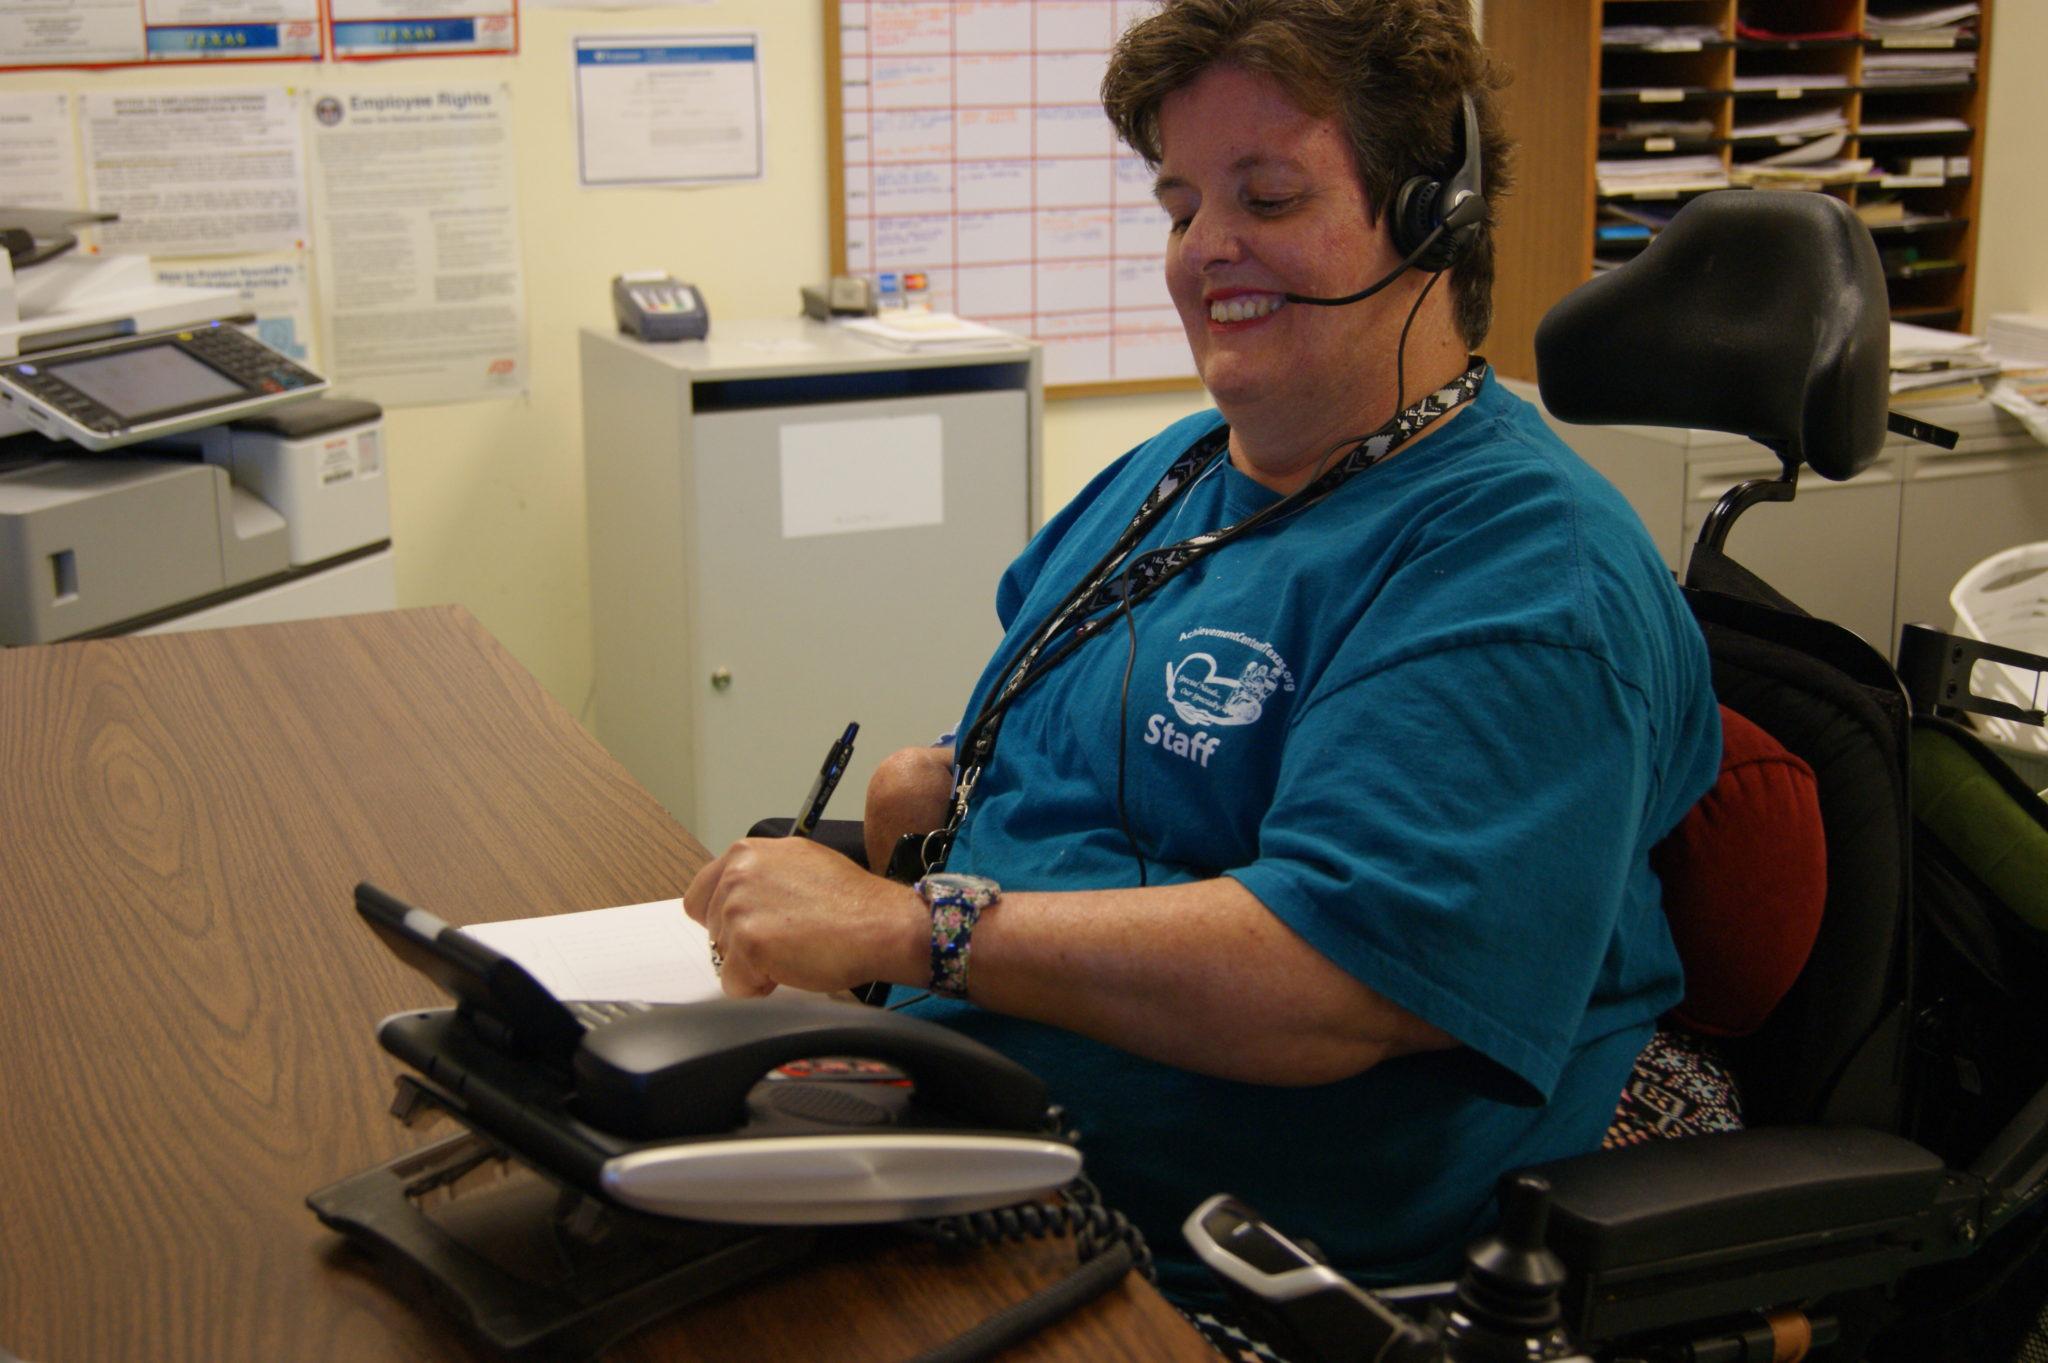 Contact Achievement Center of Texas